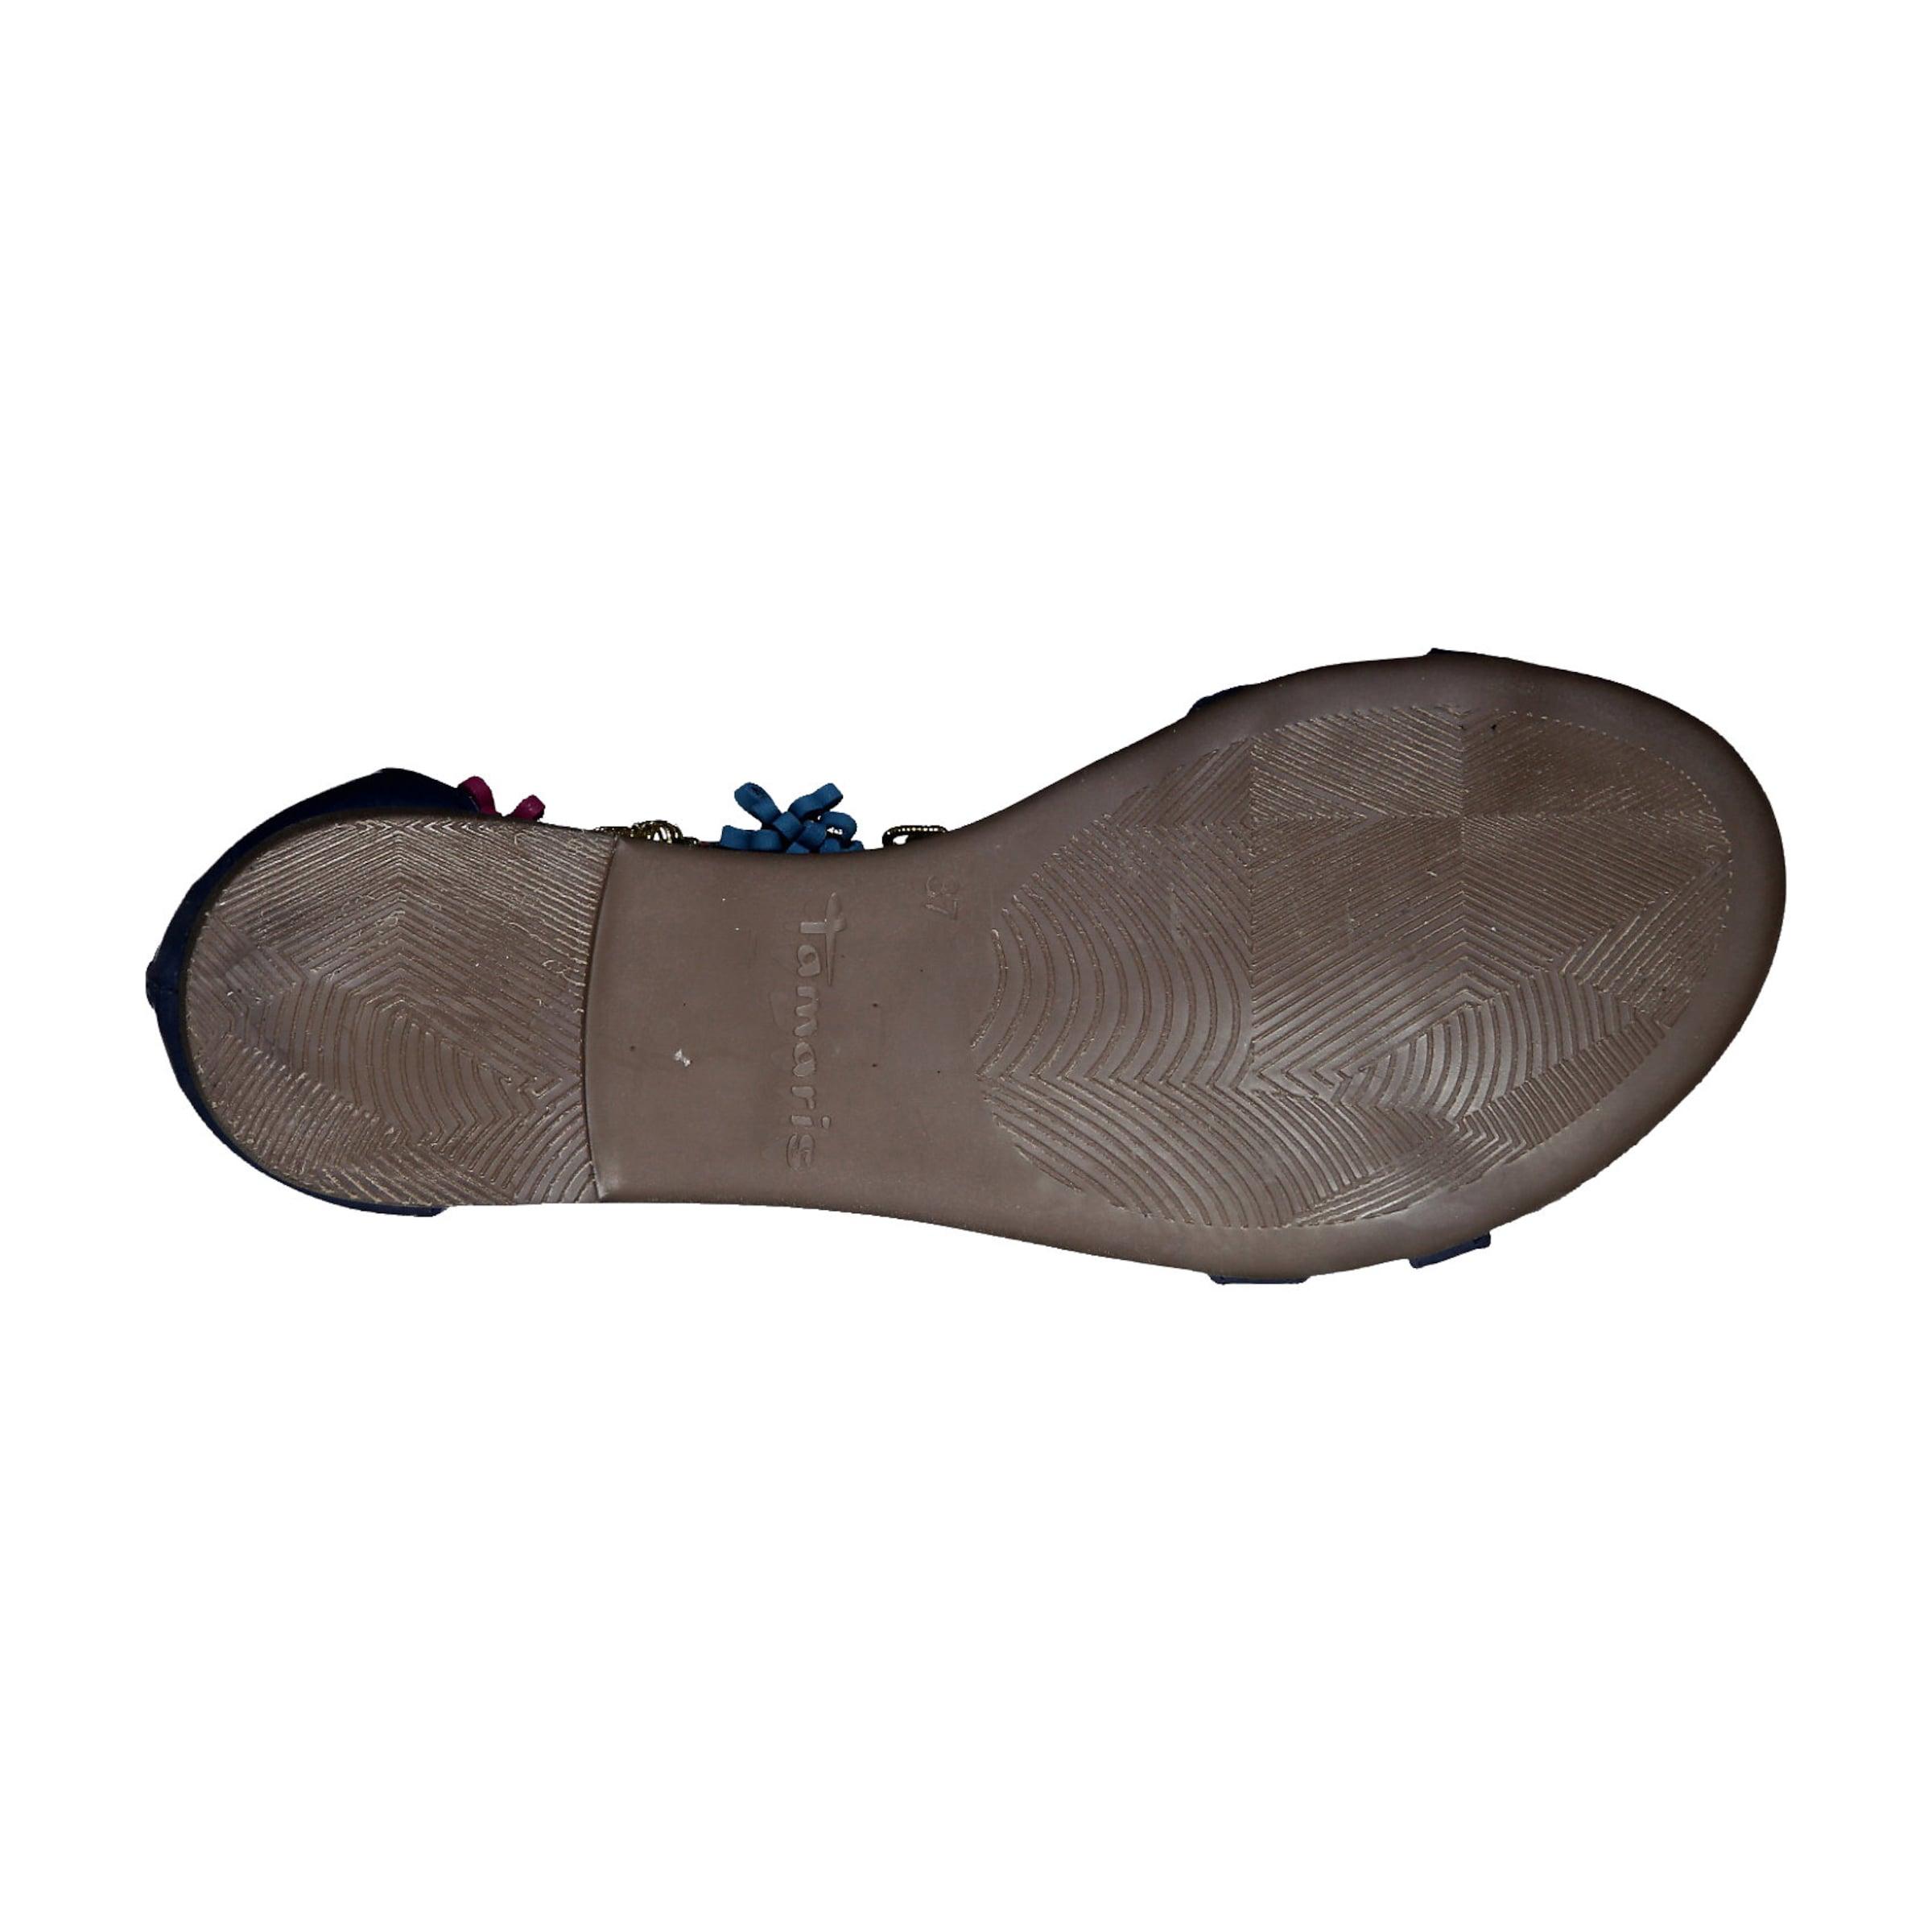 BlauDunkelpink BlauDunkelpink Sandale In Tamaris In Sandale Tamaris zVpqSUMGL